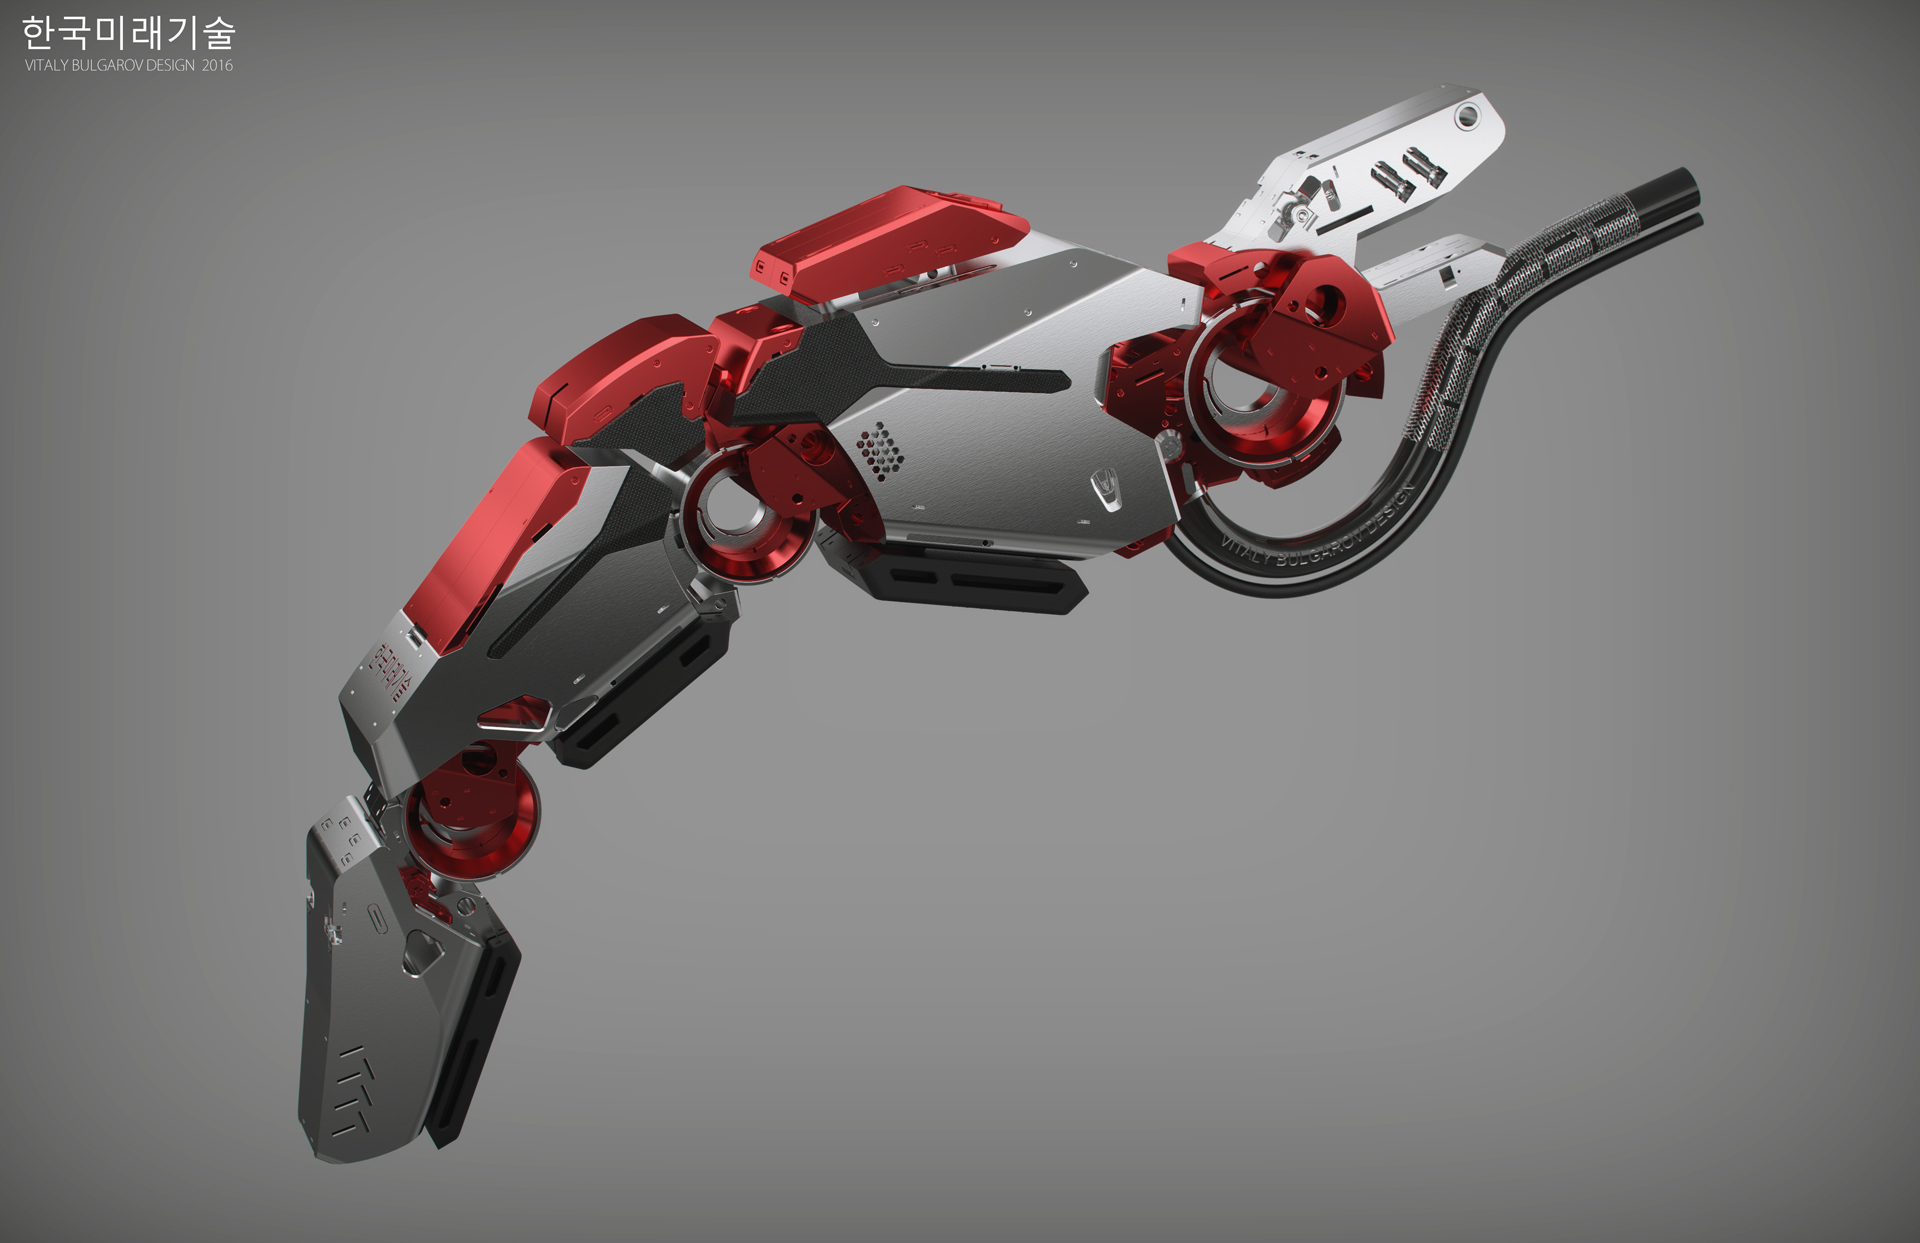 KFT_RoboticFingerDesign_16.jpg